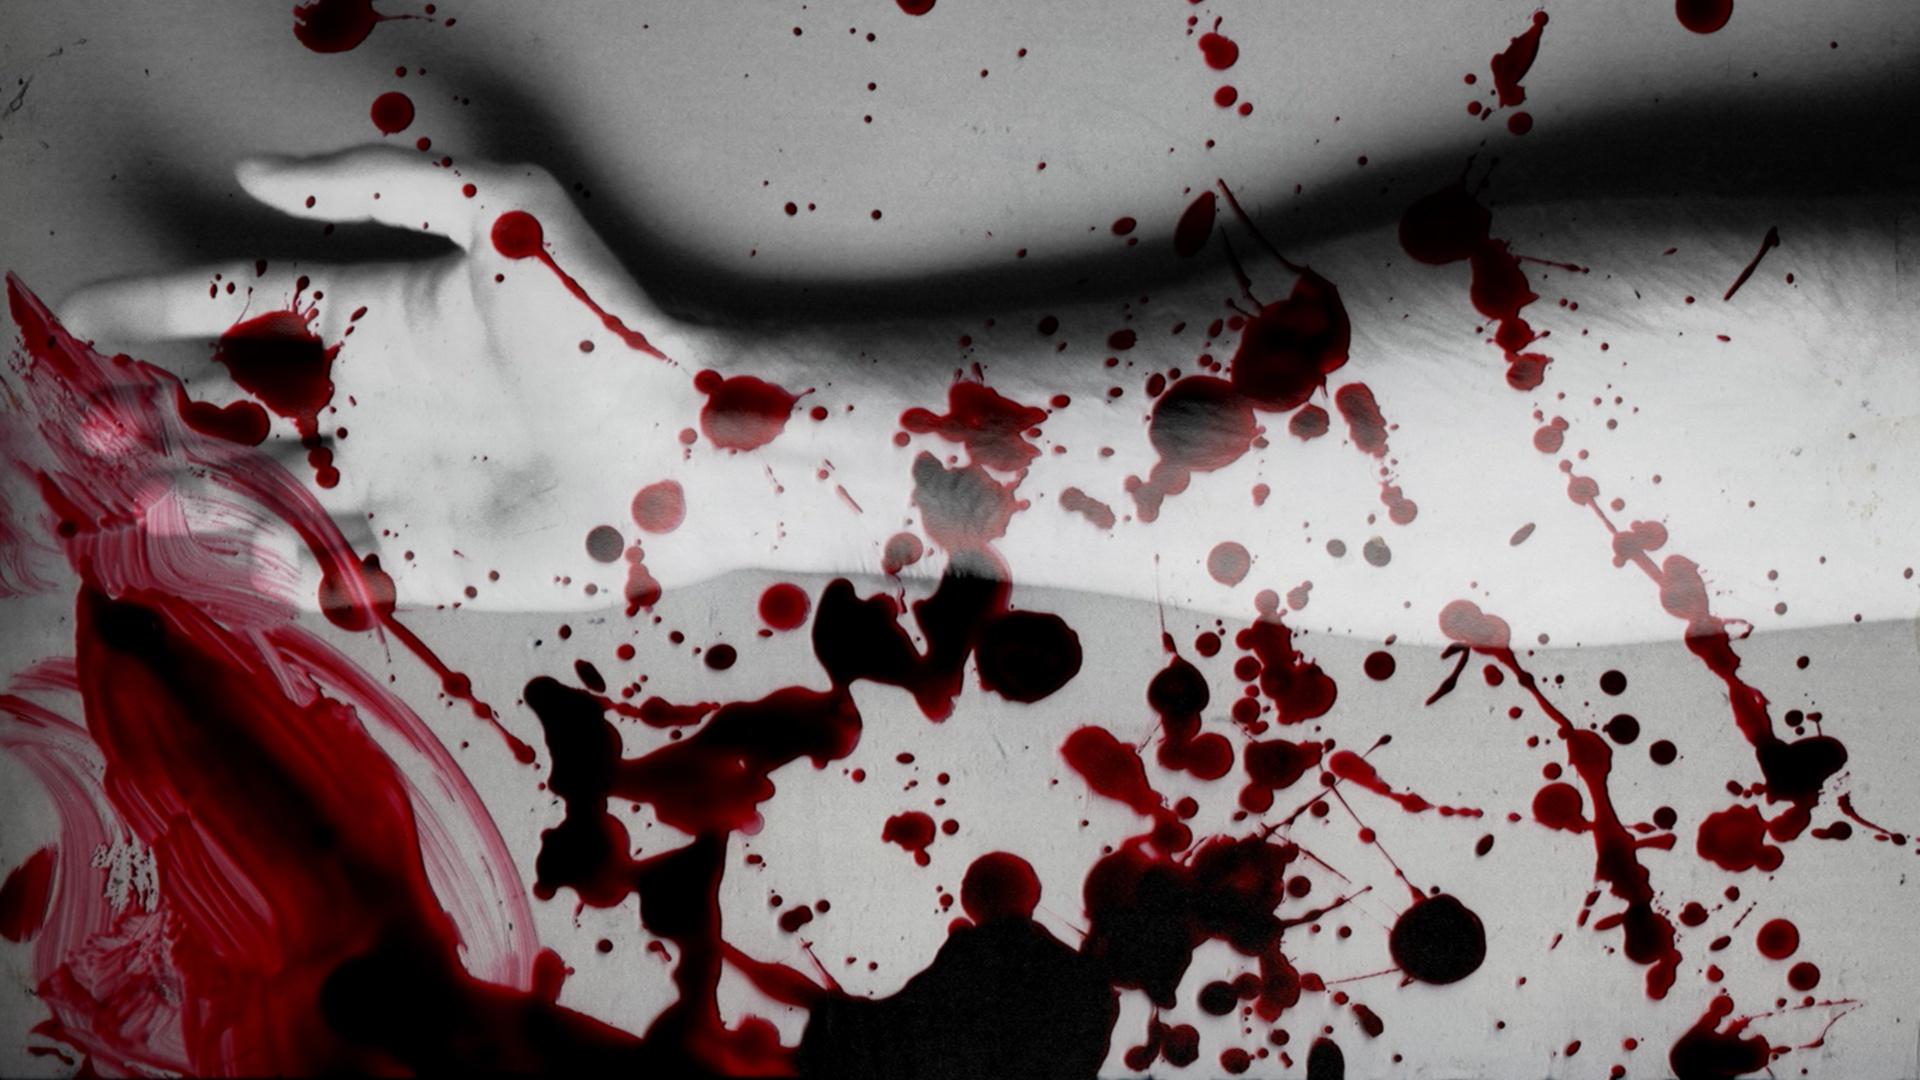 Blood Computer Wallpapers Desktop Backgrounds  1920x1080